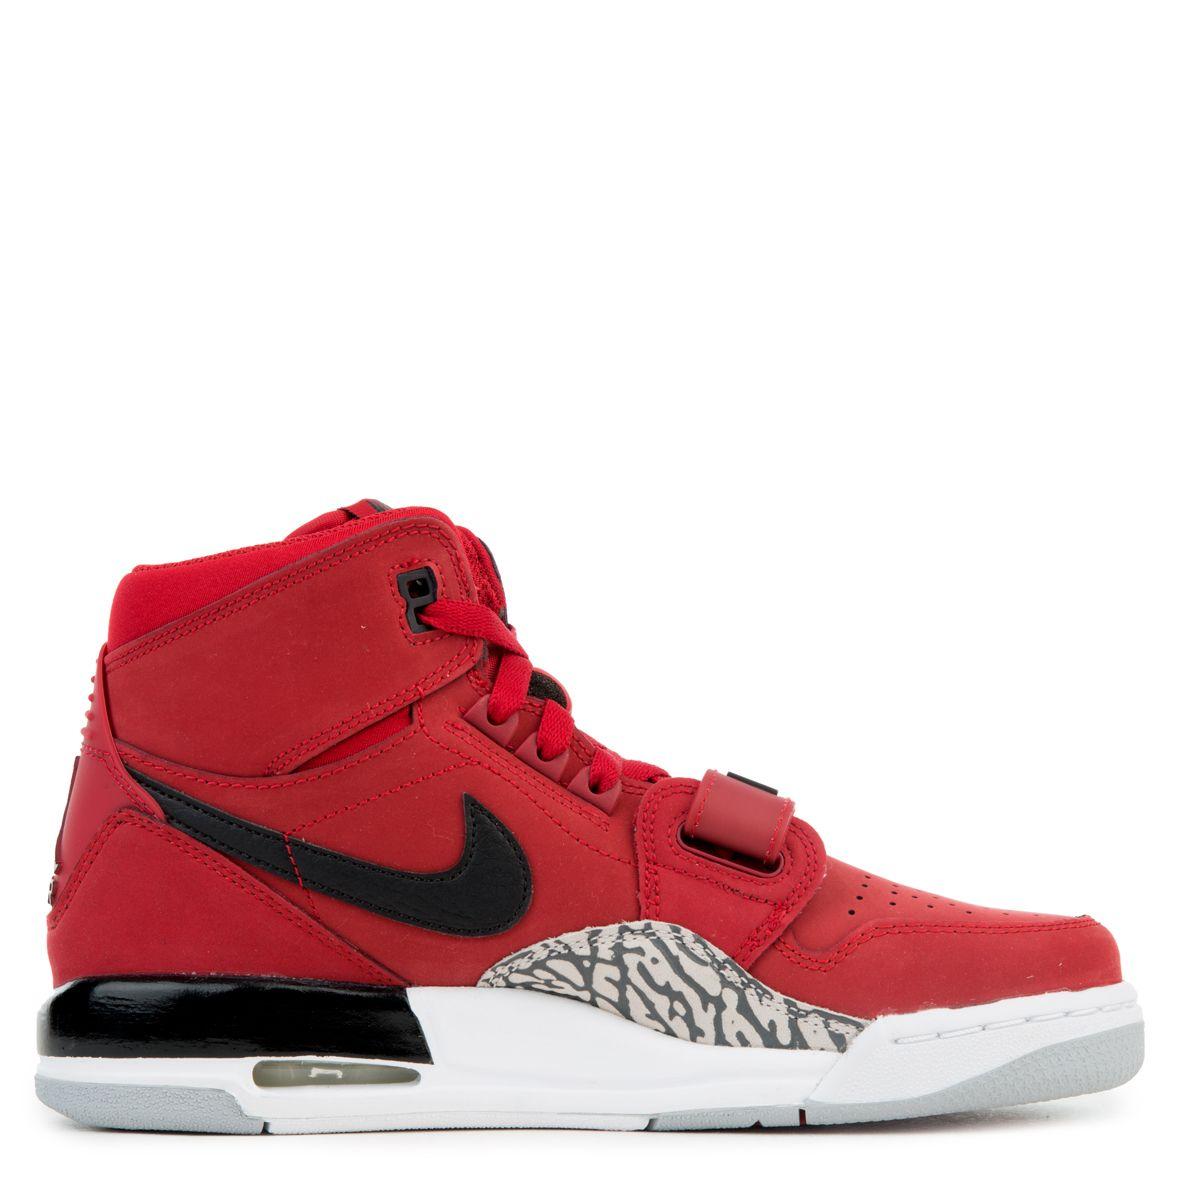 sports shoes 9d22f 4b3af ... AIR JORDAN LEGACY 312 VARSITY RED BLACK-WHITE ...